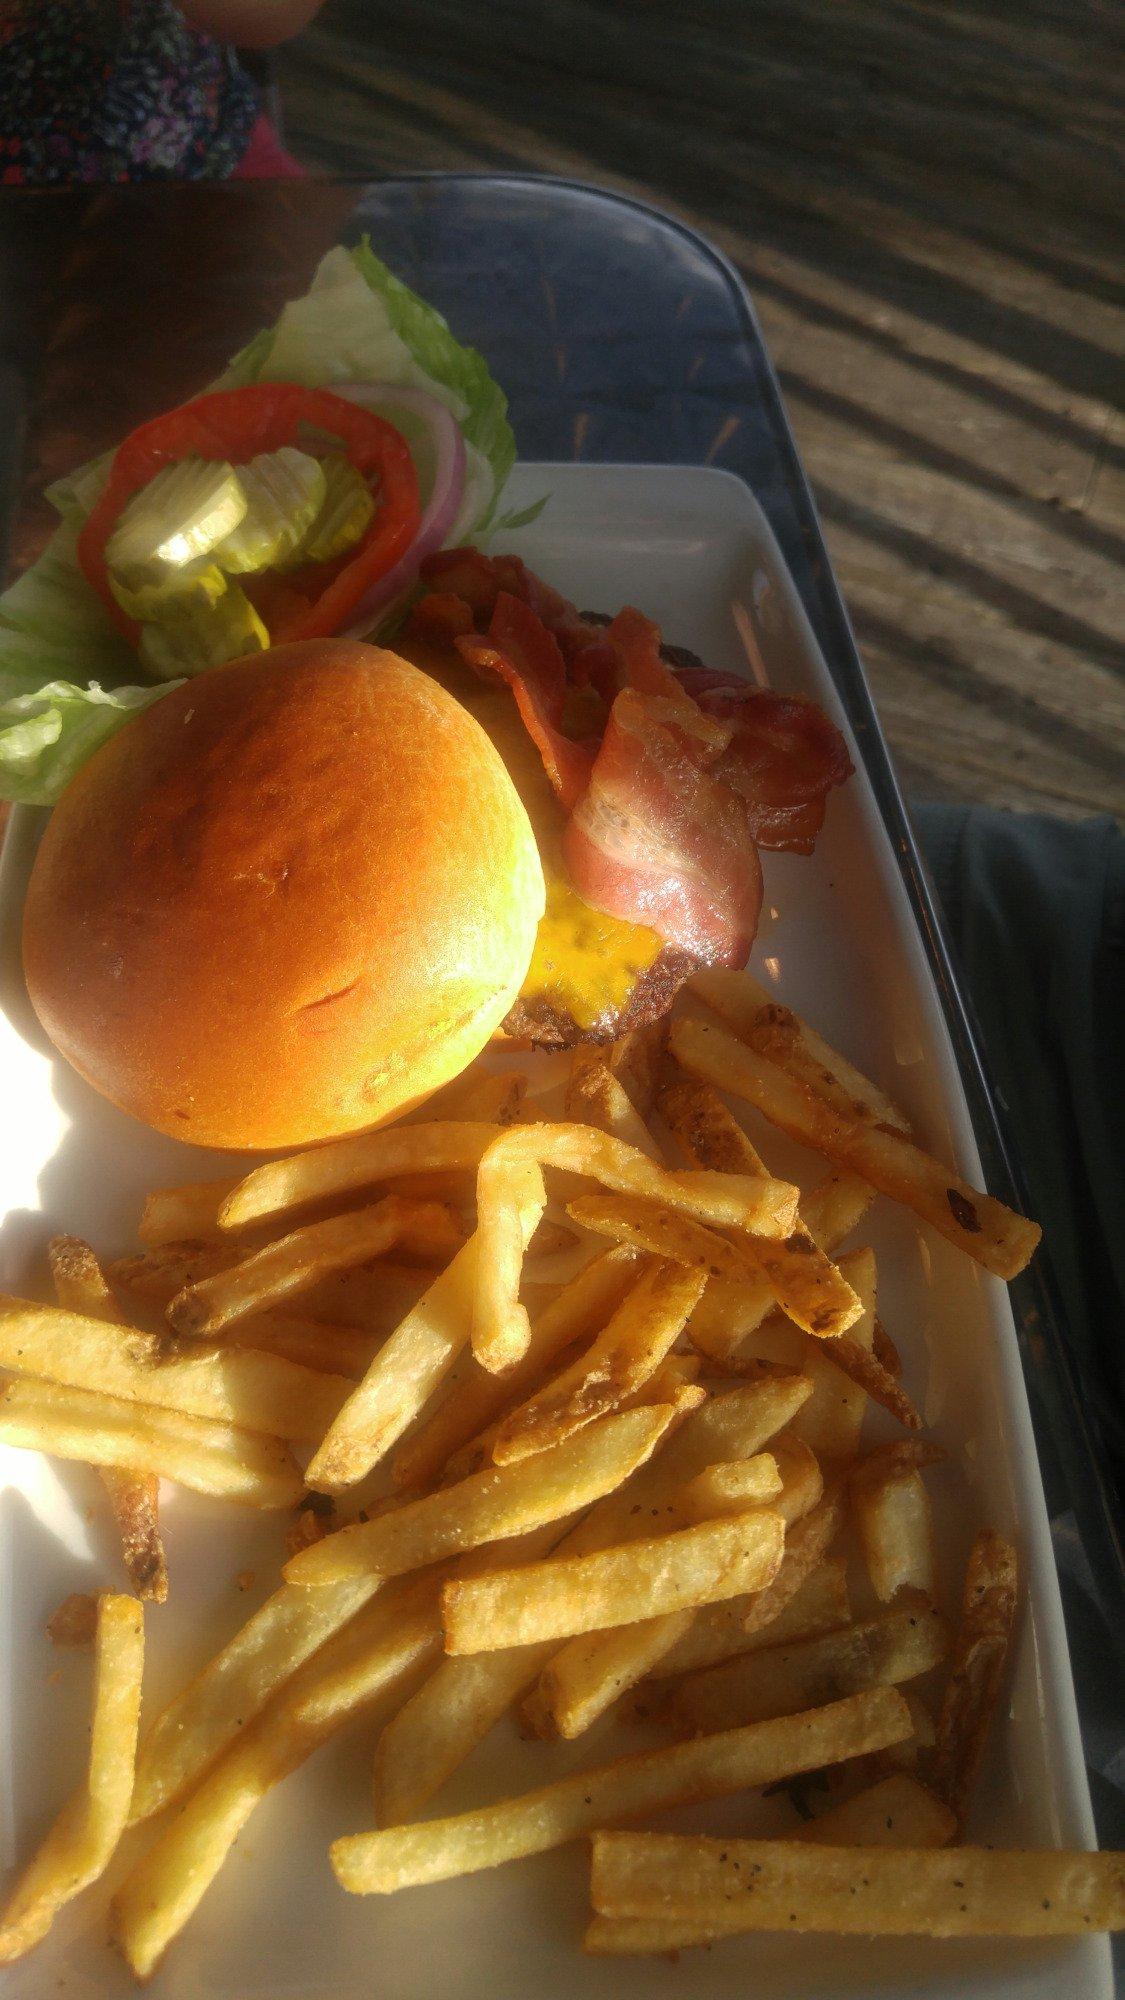 Applebee s merritt island 100 n sykes creek pkwy restaurant reviews phone number photos tripadvisor